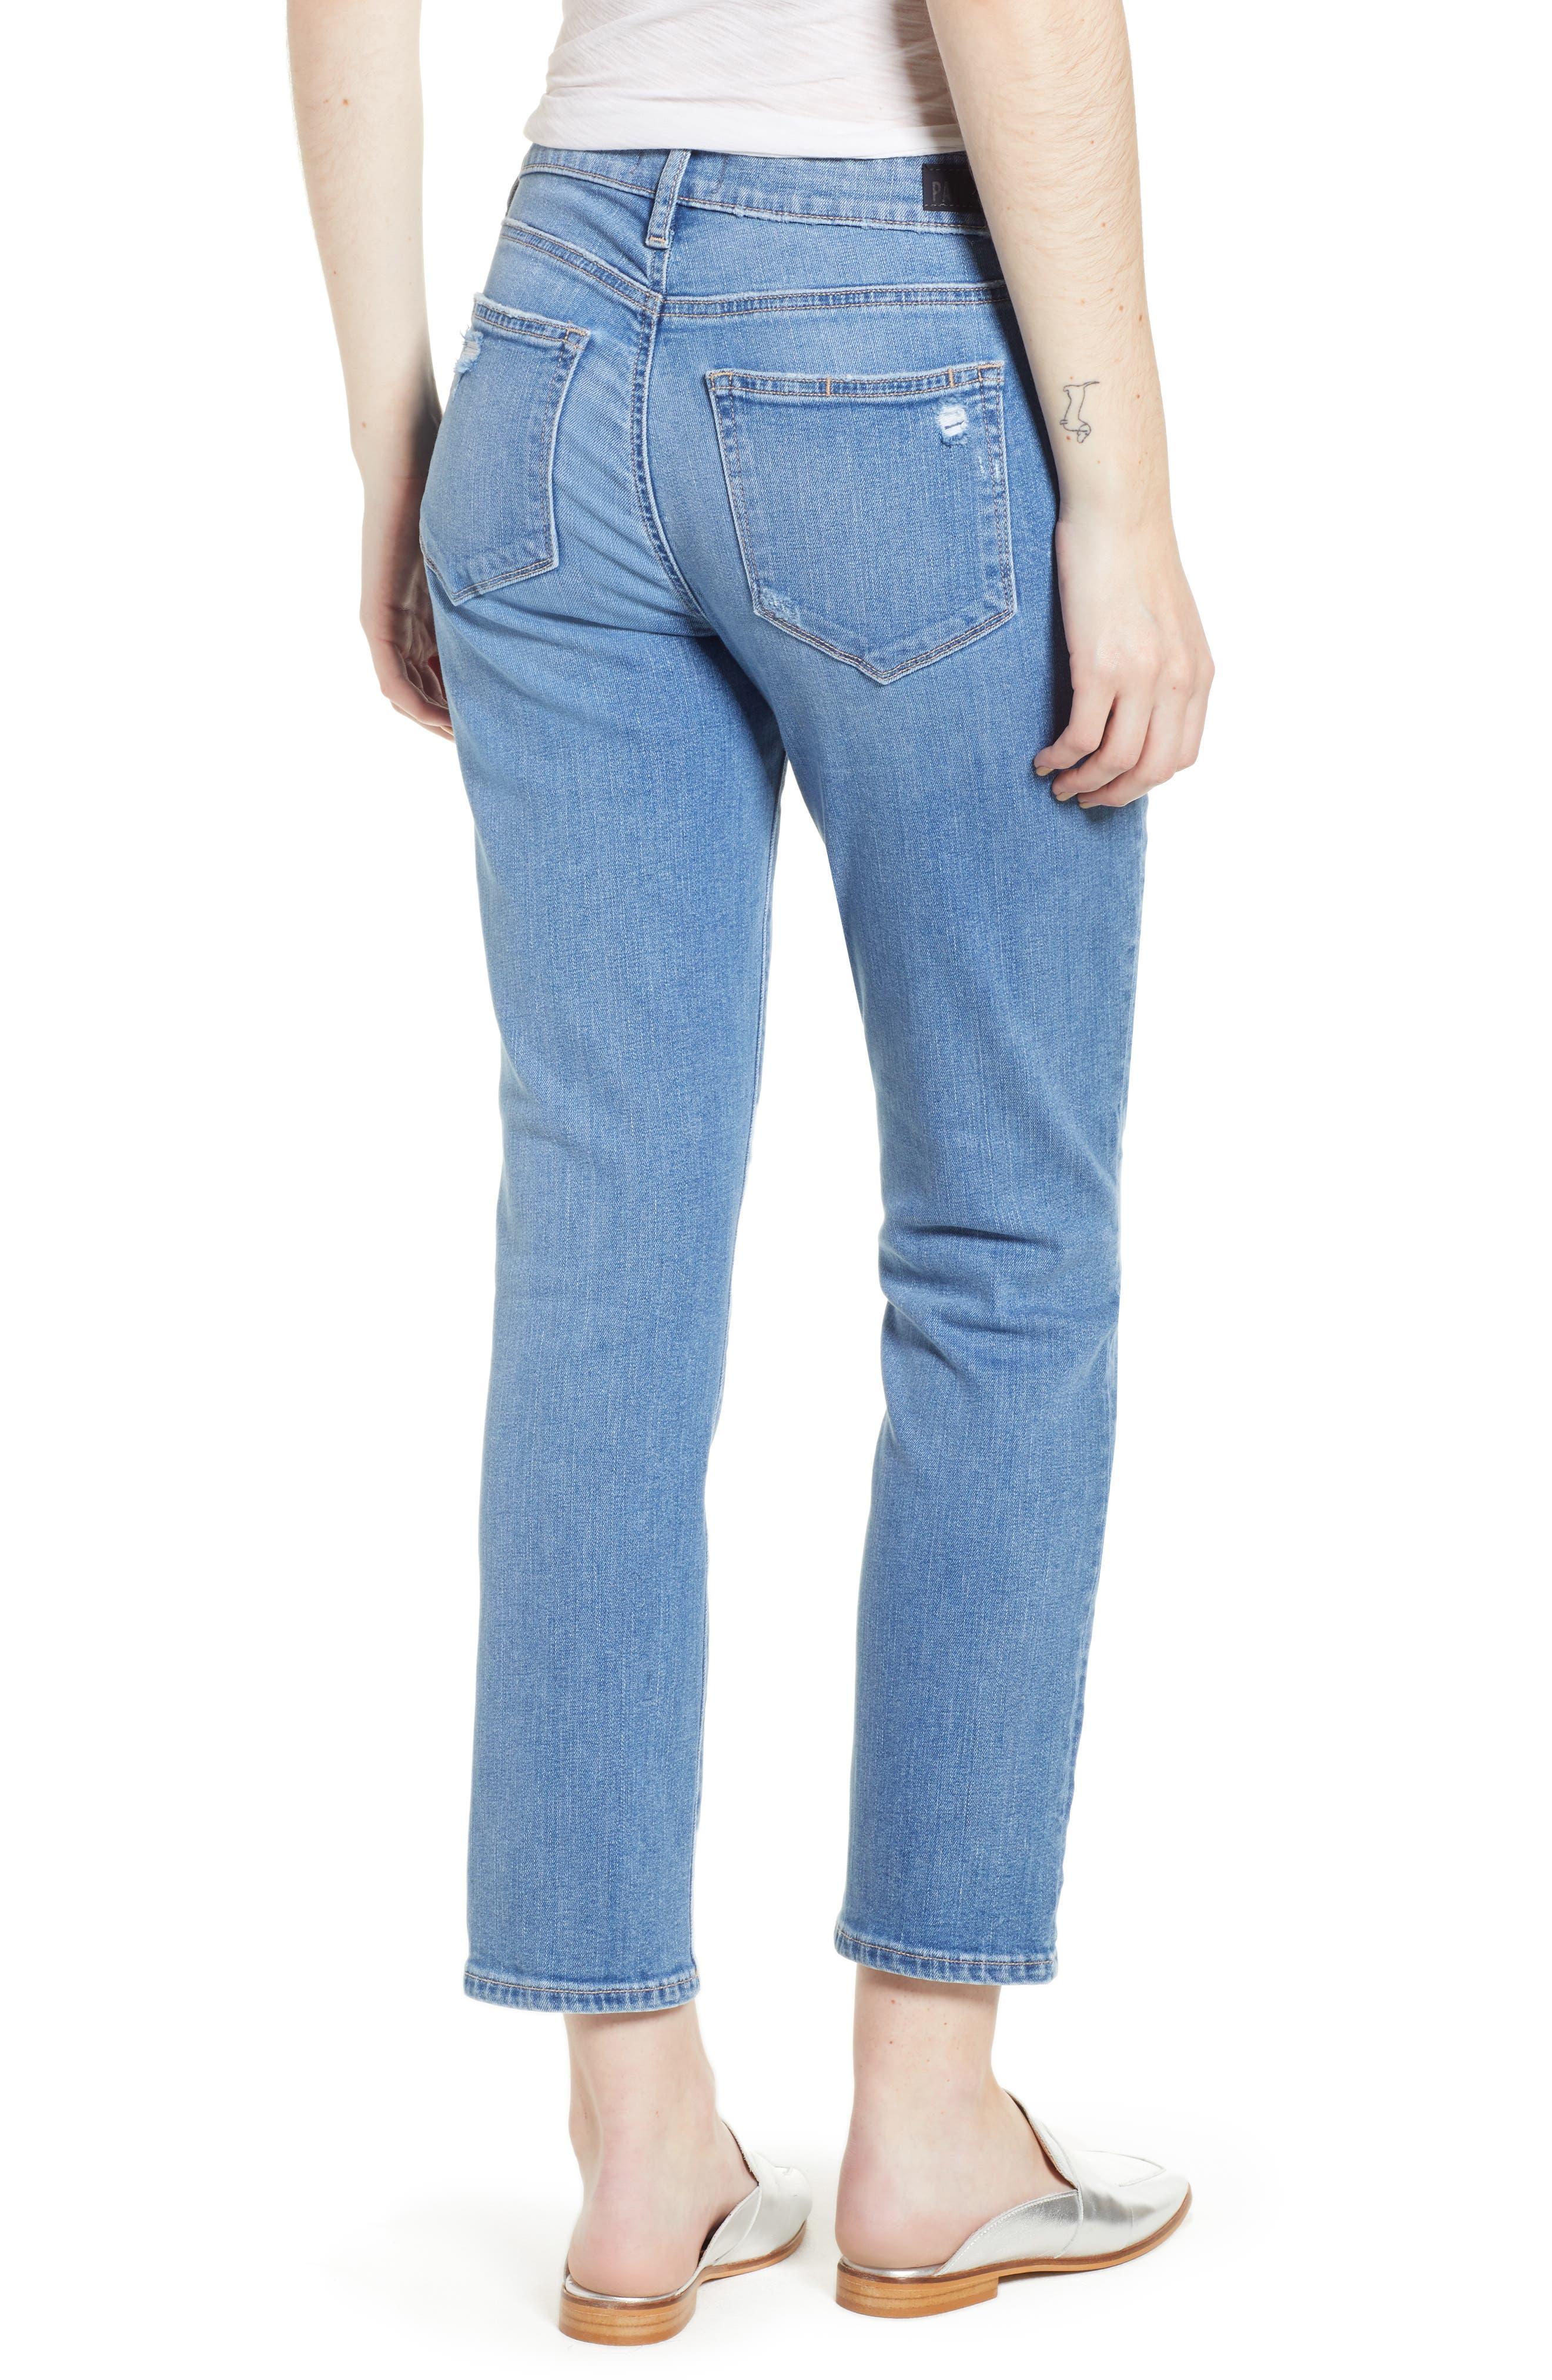 Transcend Vintage - Jimmy Jimmy High Waist Crop Boyfriend Jeans,                             Alternate thumbnail 2, color,                             VINTAGE VENICE